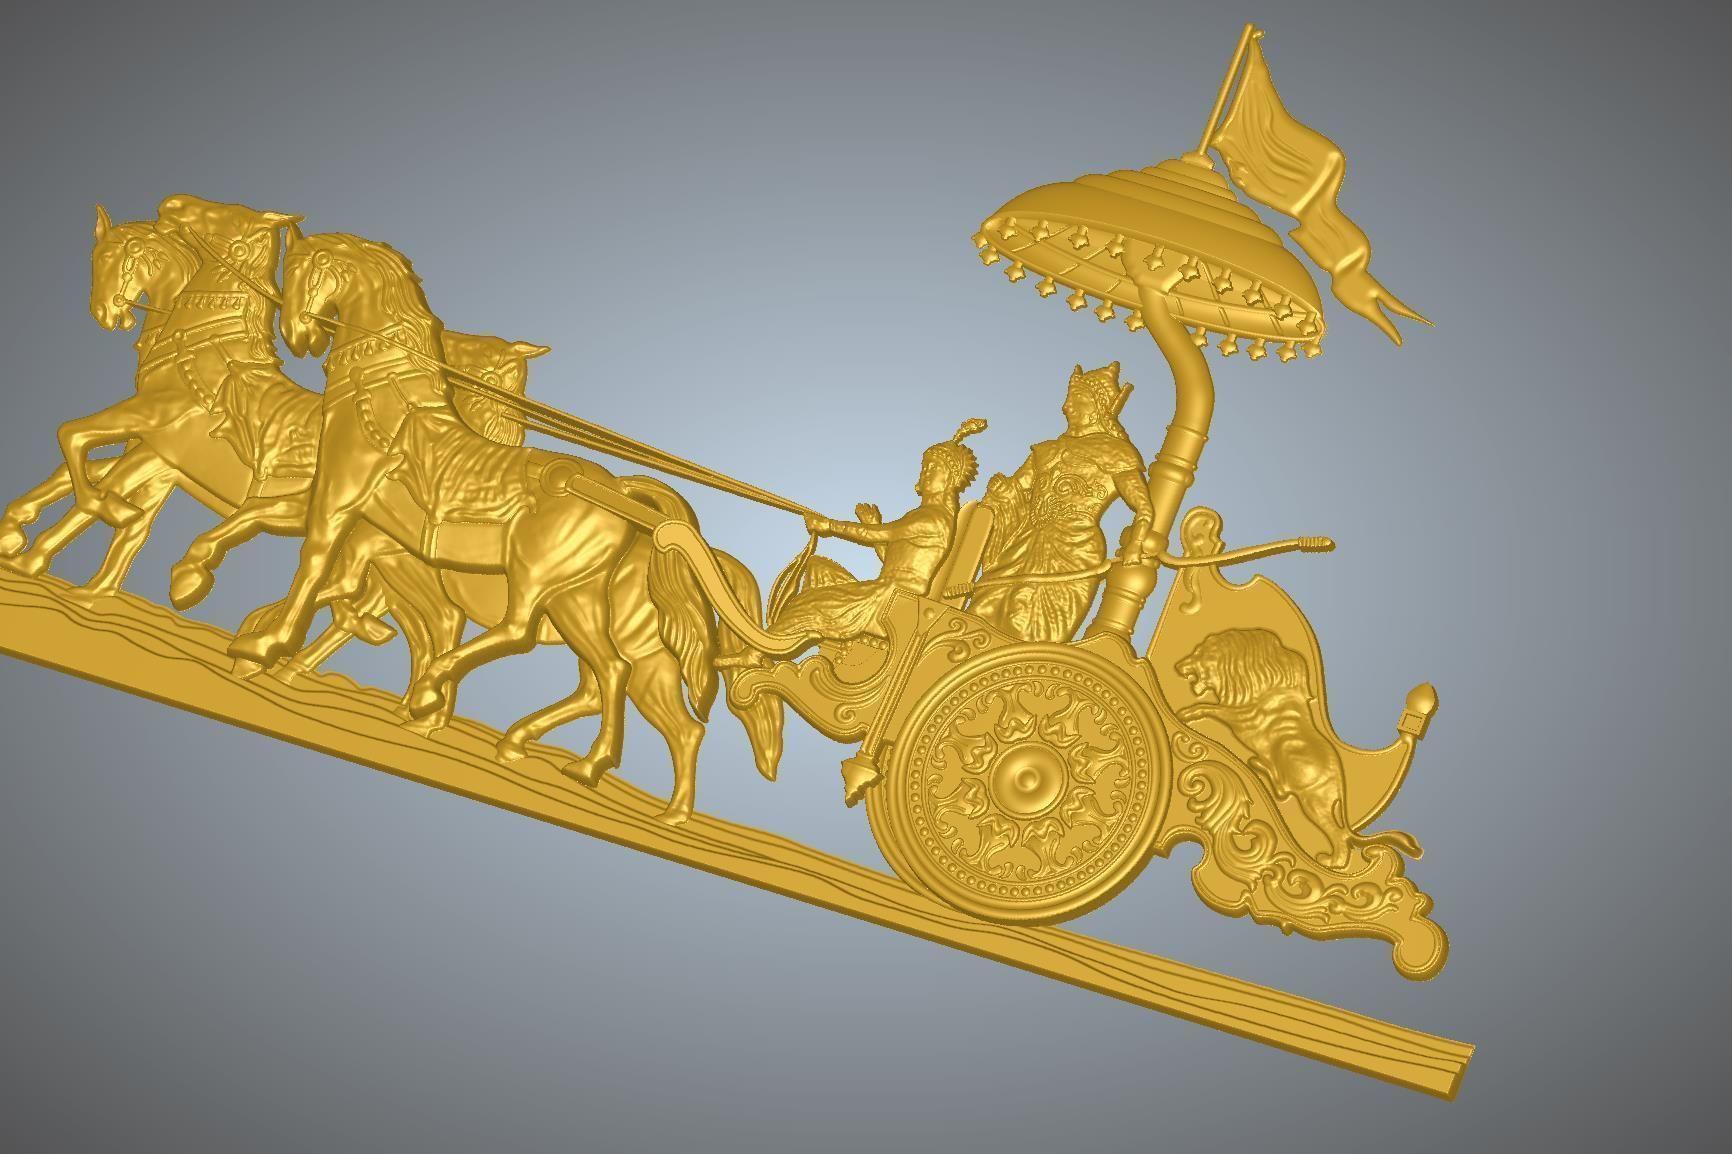 Krishna Arjuna Chariot Bhagwad Geeta